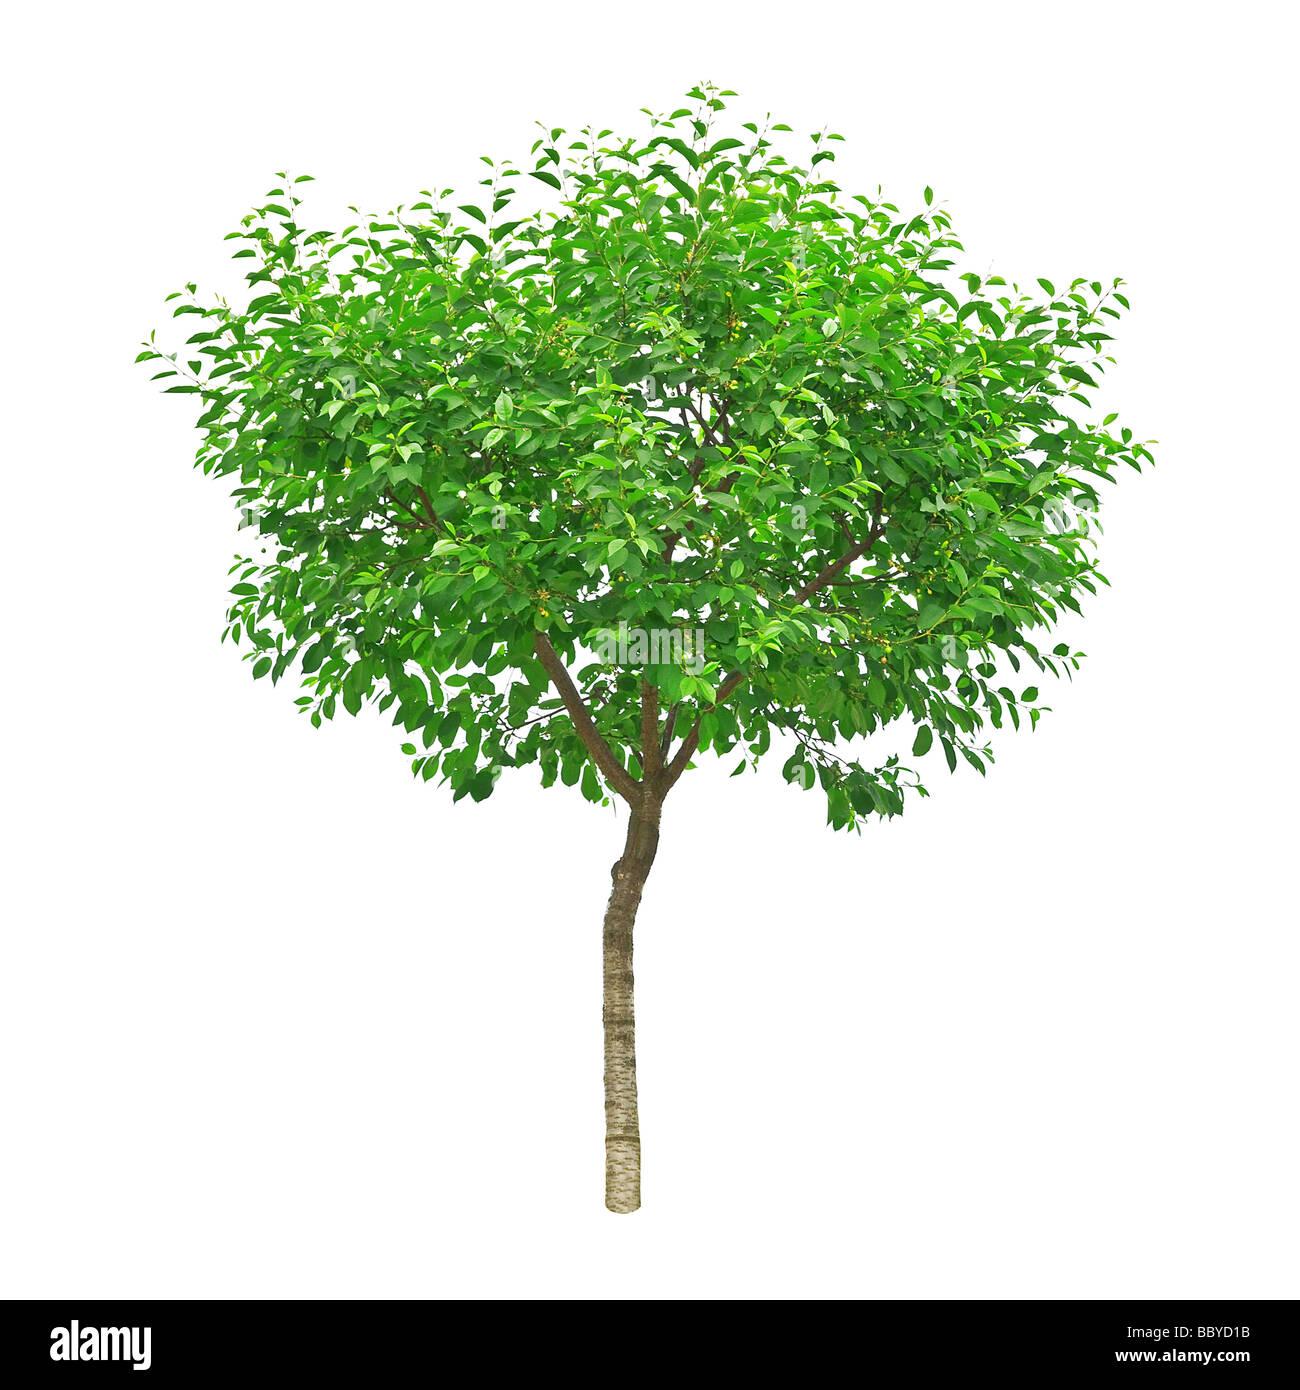 tree isolated on the white background - Stock Image